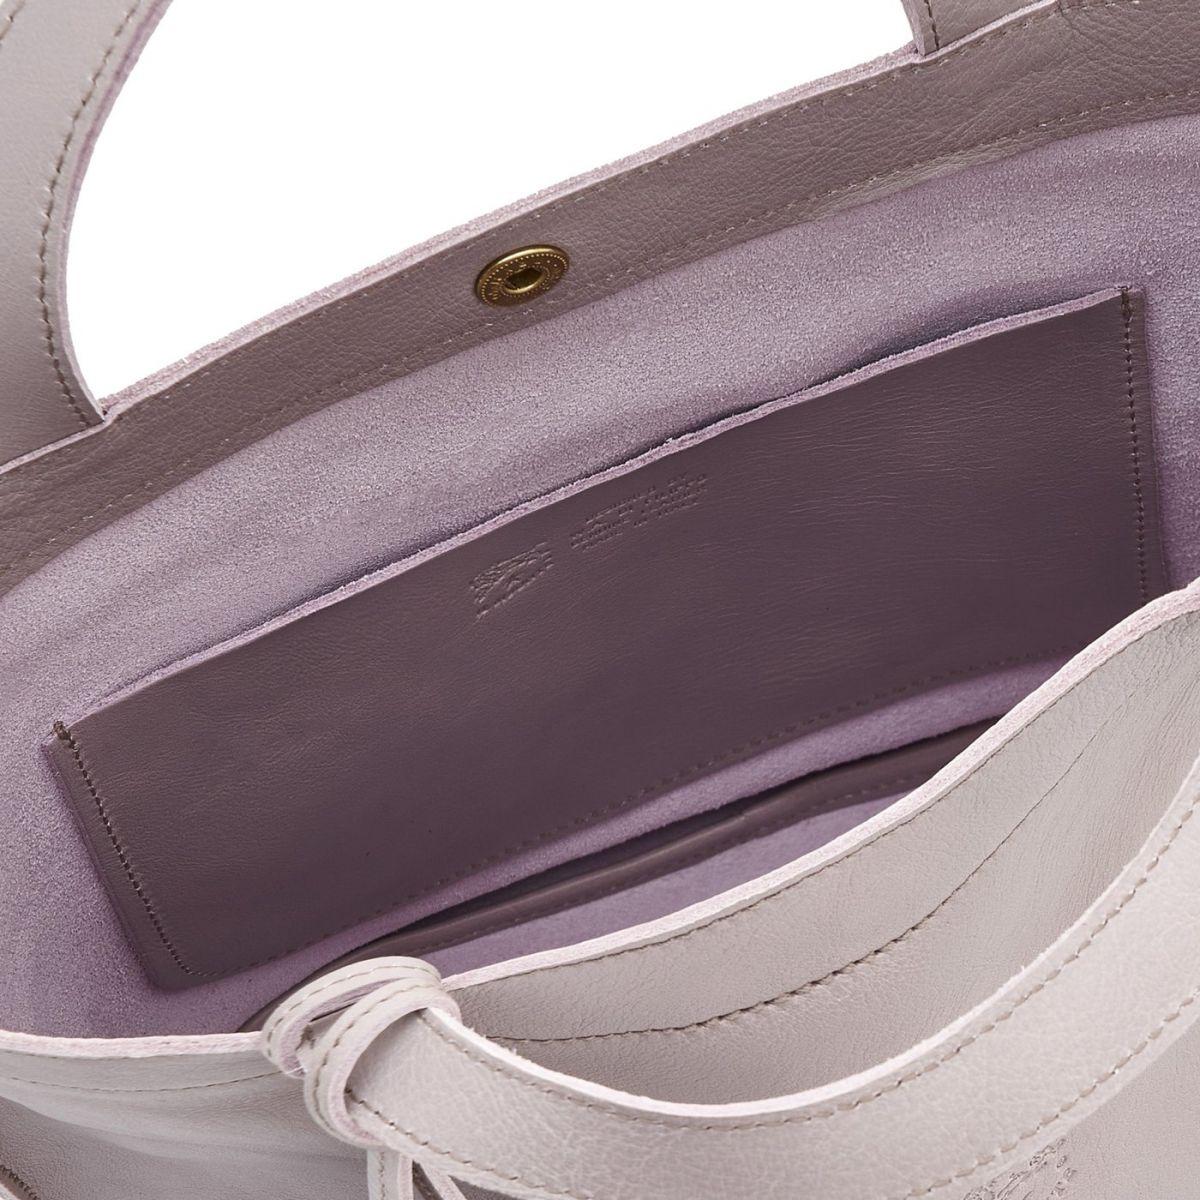 Cristina - Women's Handbag in Cowhide Leather color Mauve - Stibbert line BTH045 | Details